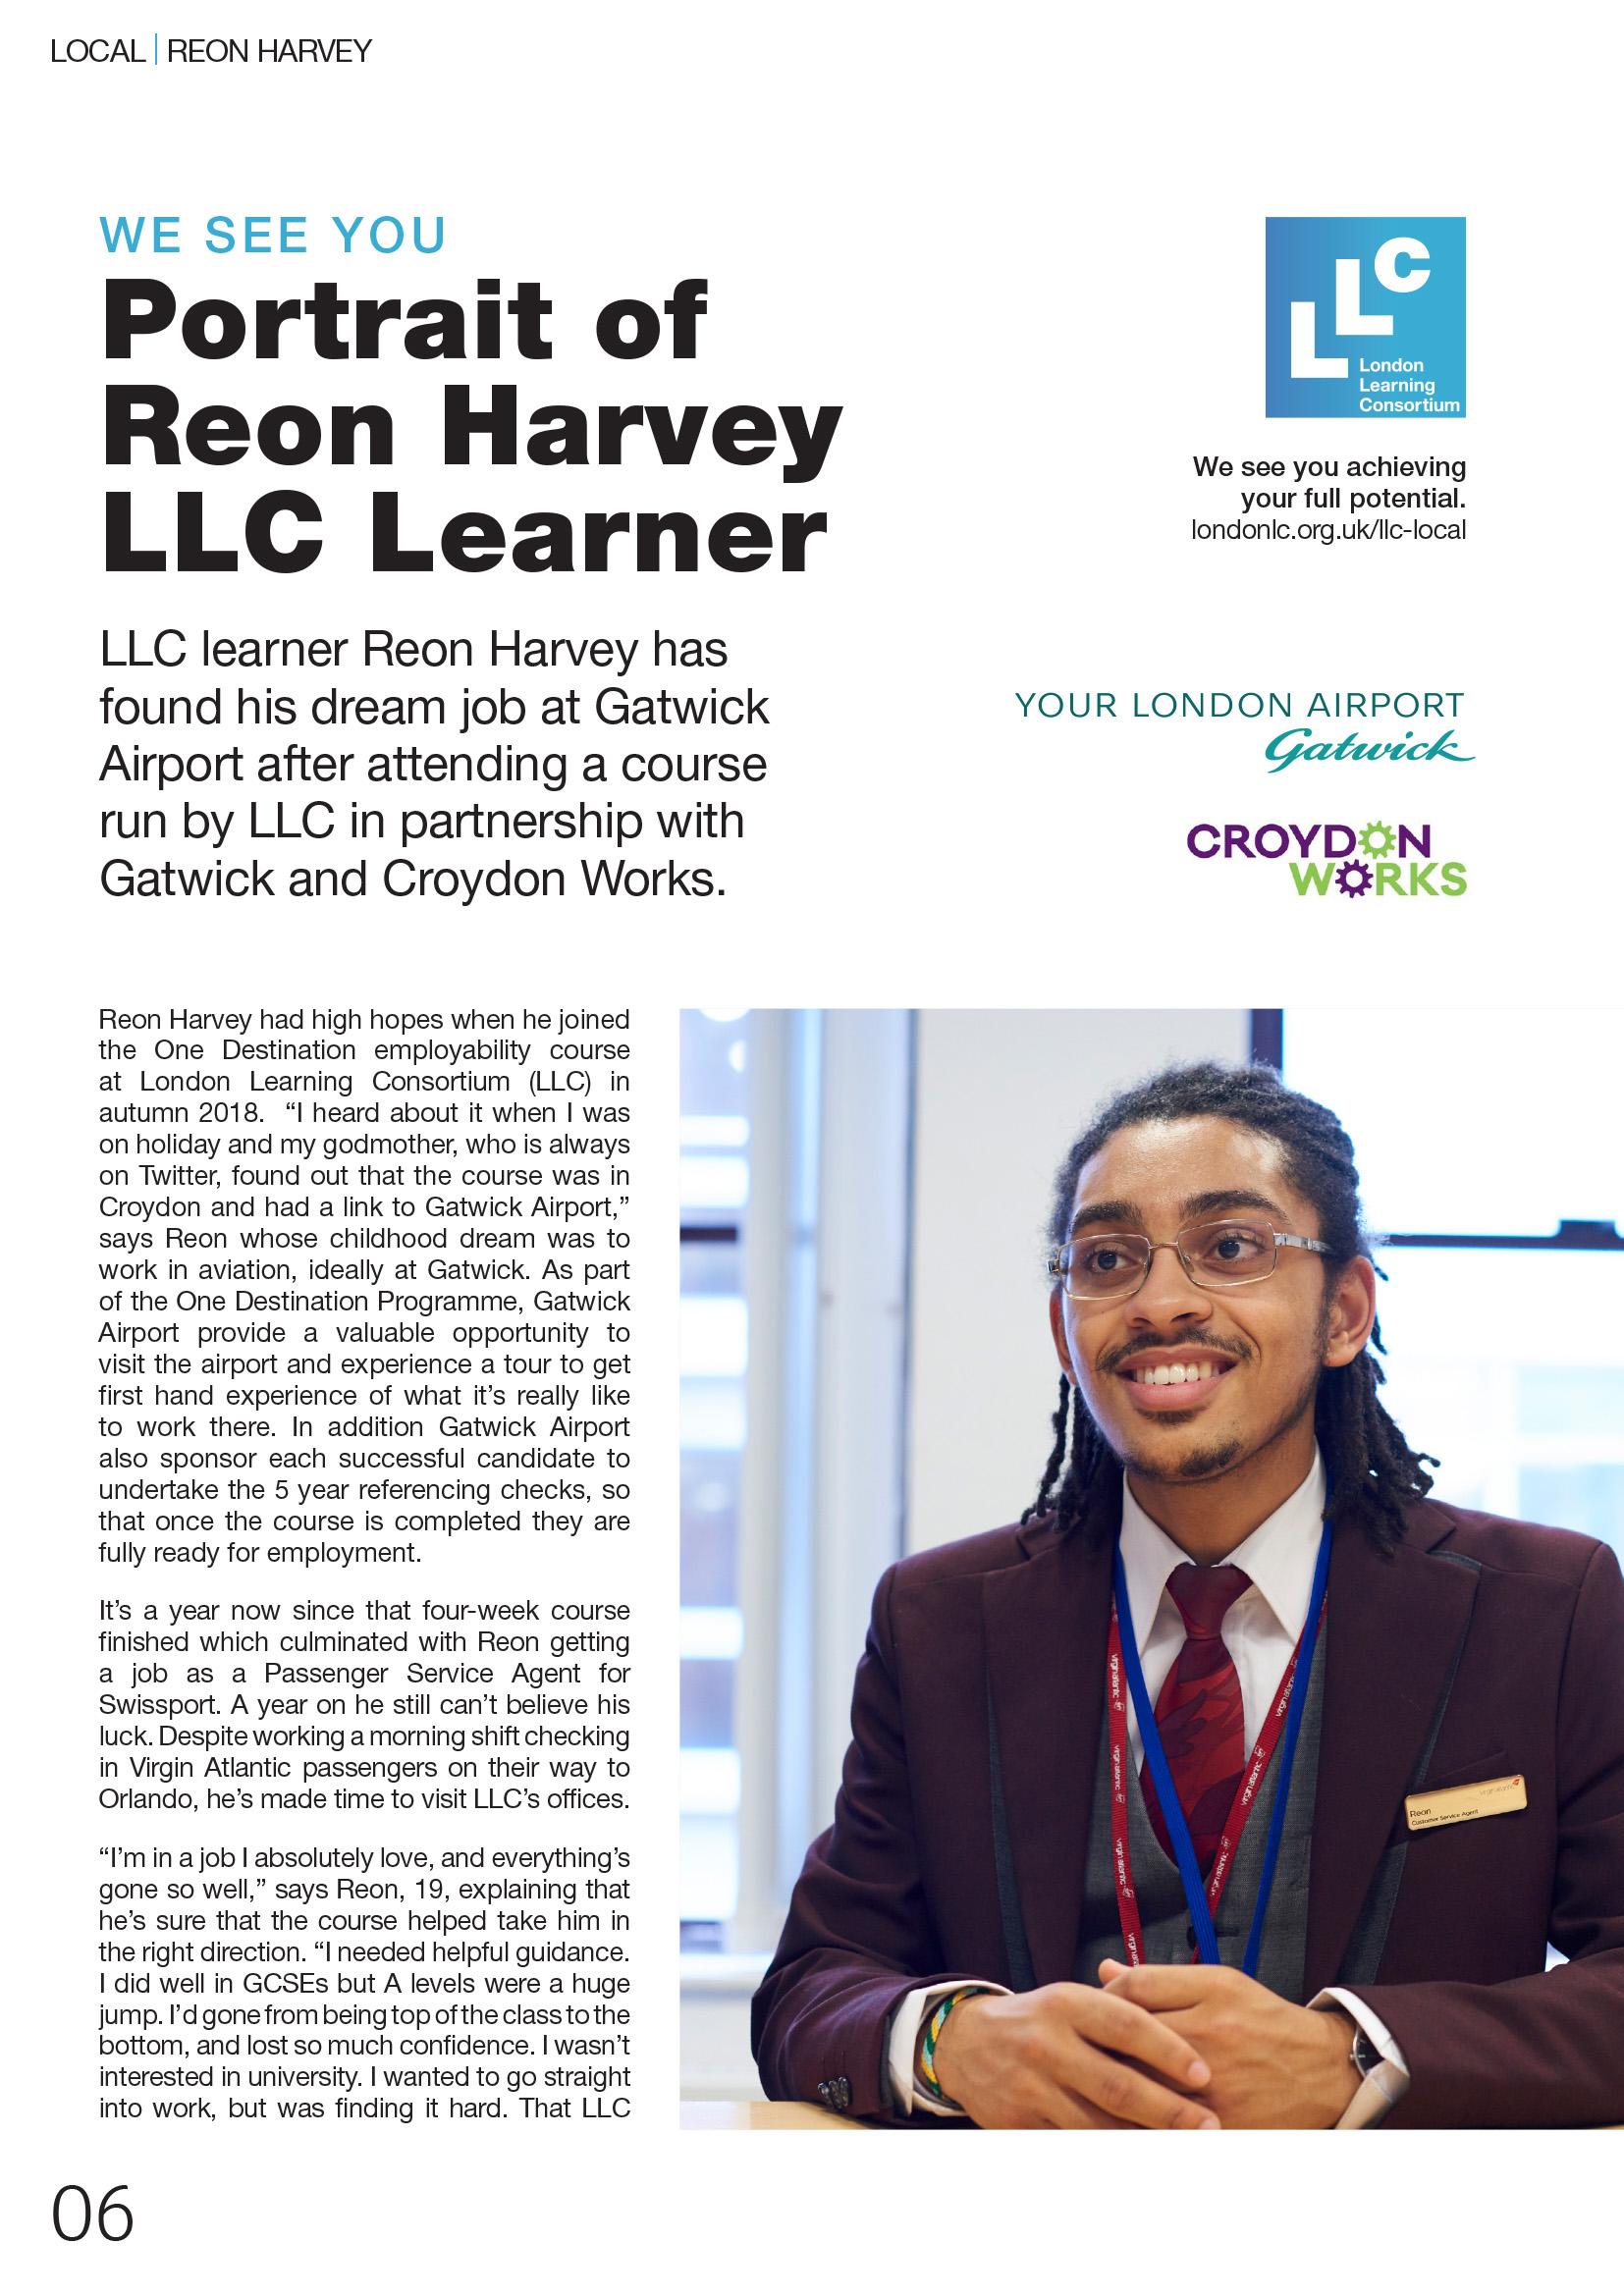 Portrait of Reon Harvey London Learning Consortium Learner